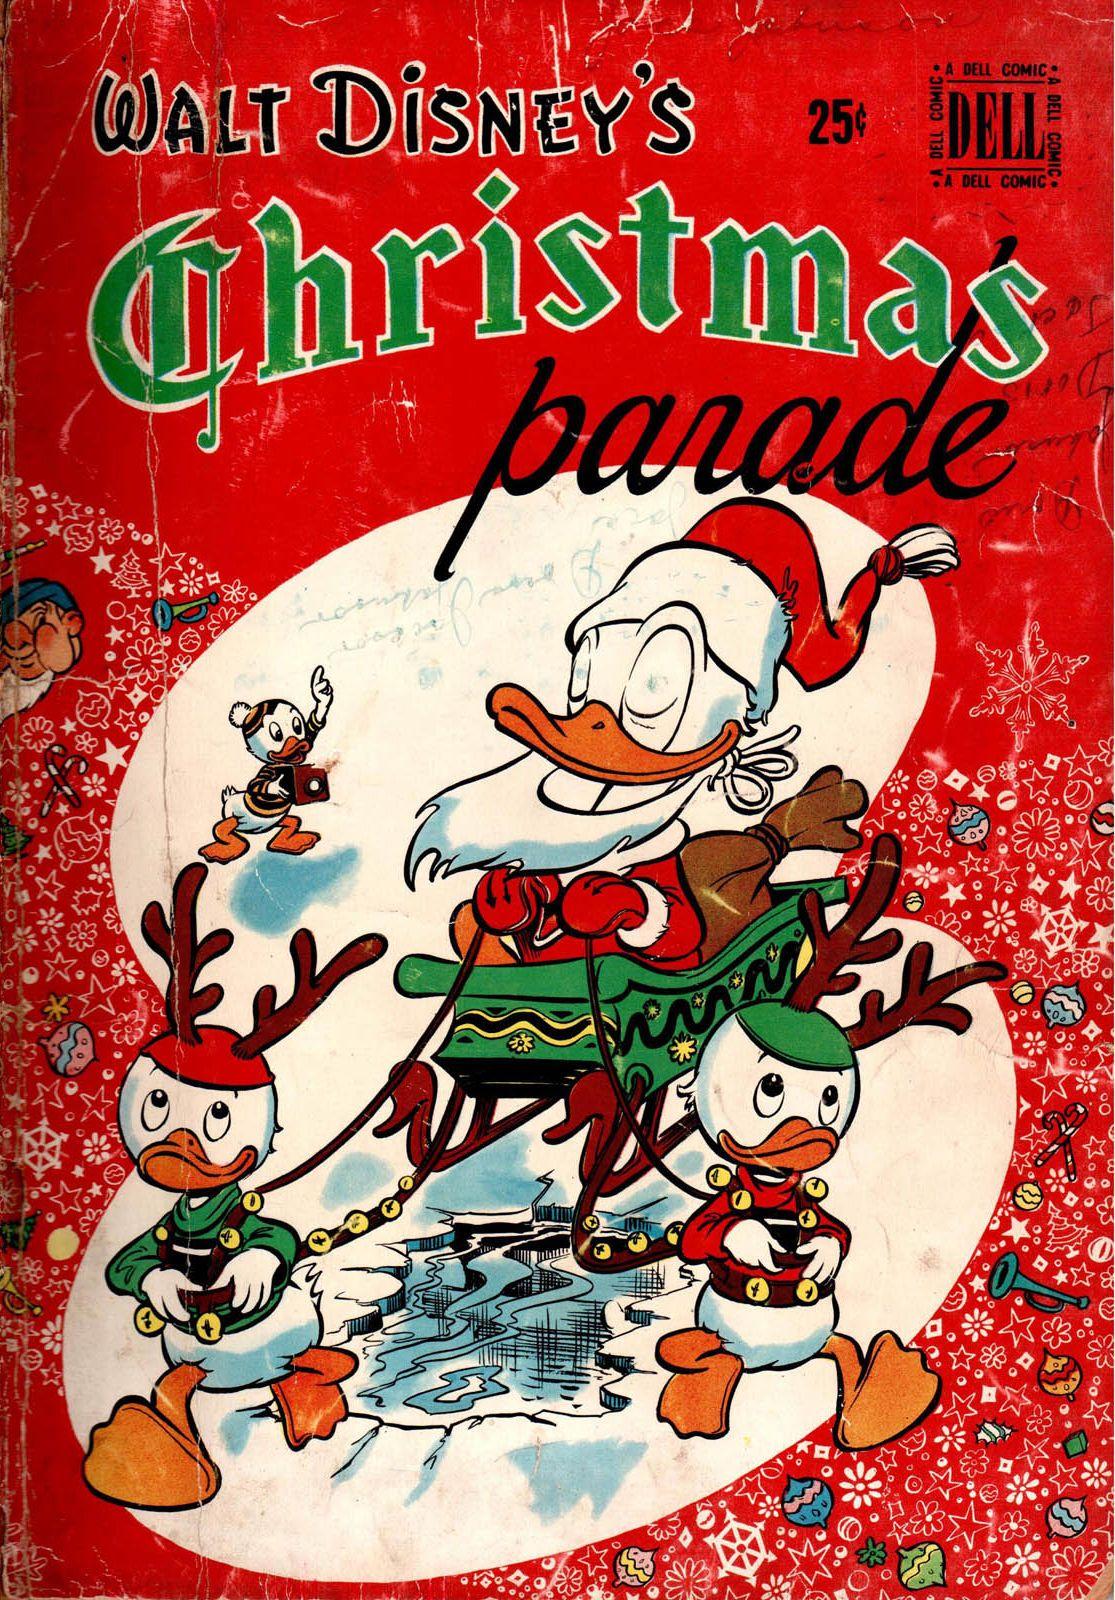 Lettre Pere Noel Disney.La Lettre Du Pere Noel Donald Duck Carl Barks Senscritique